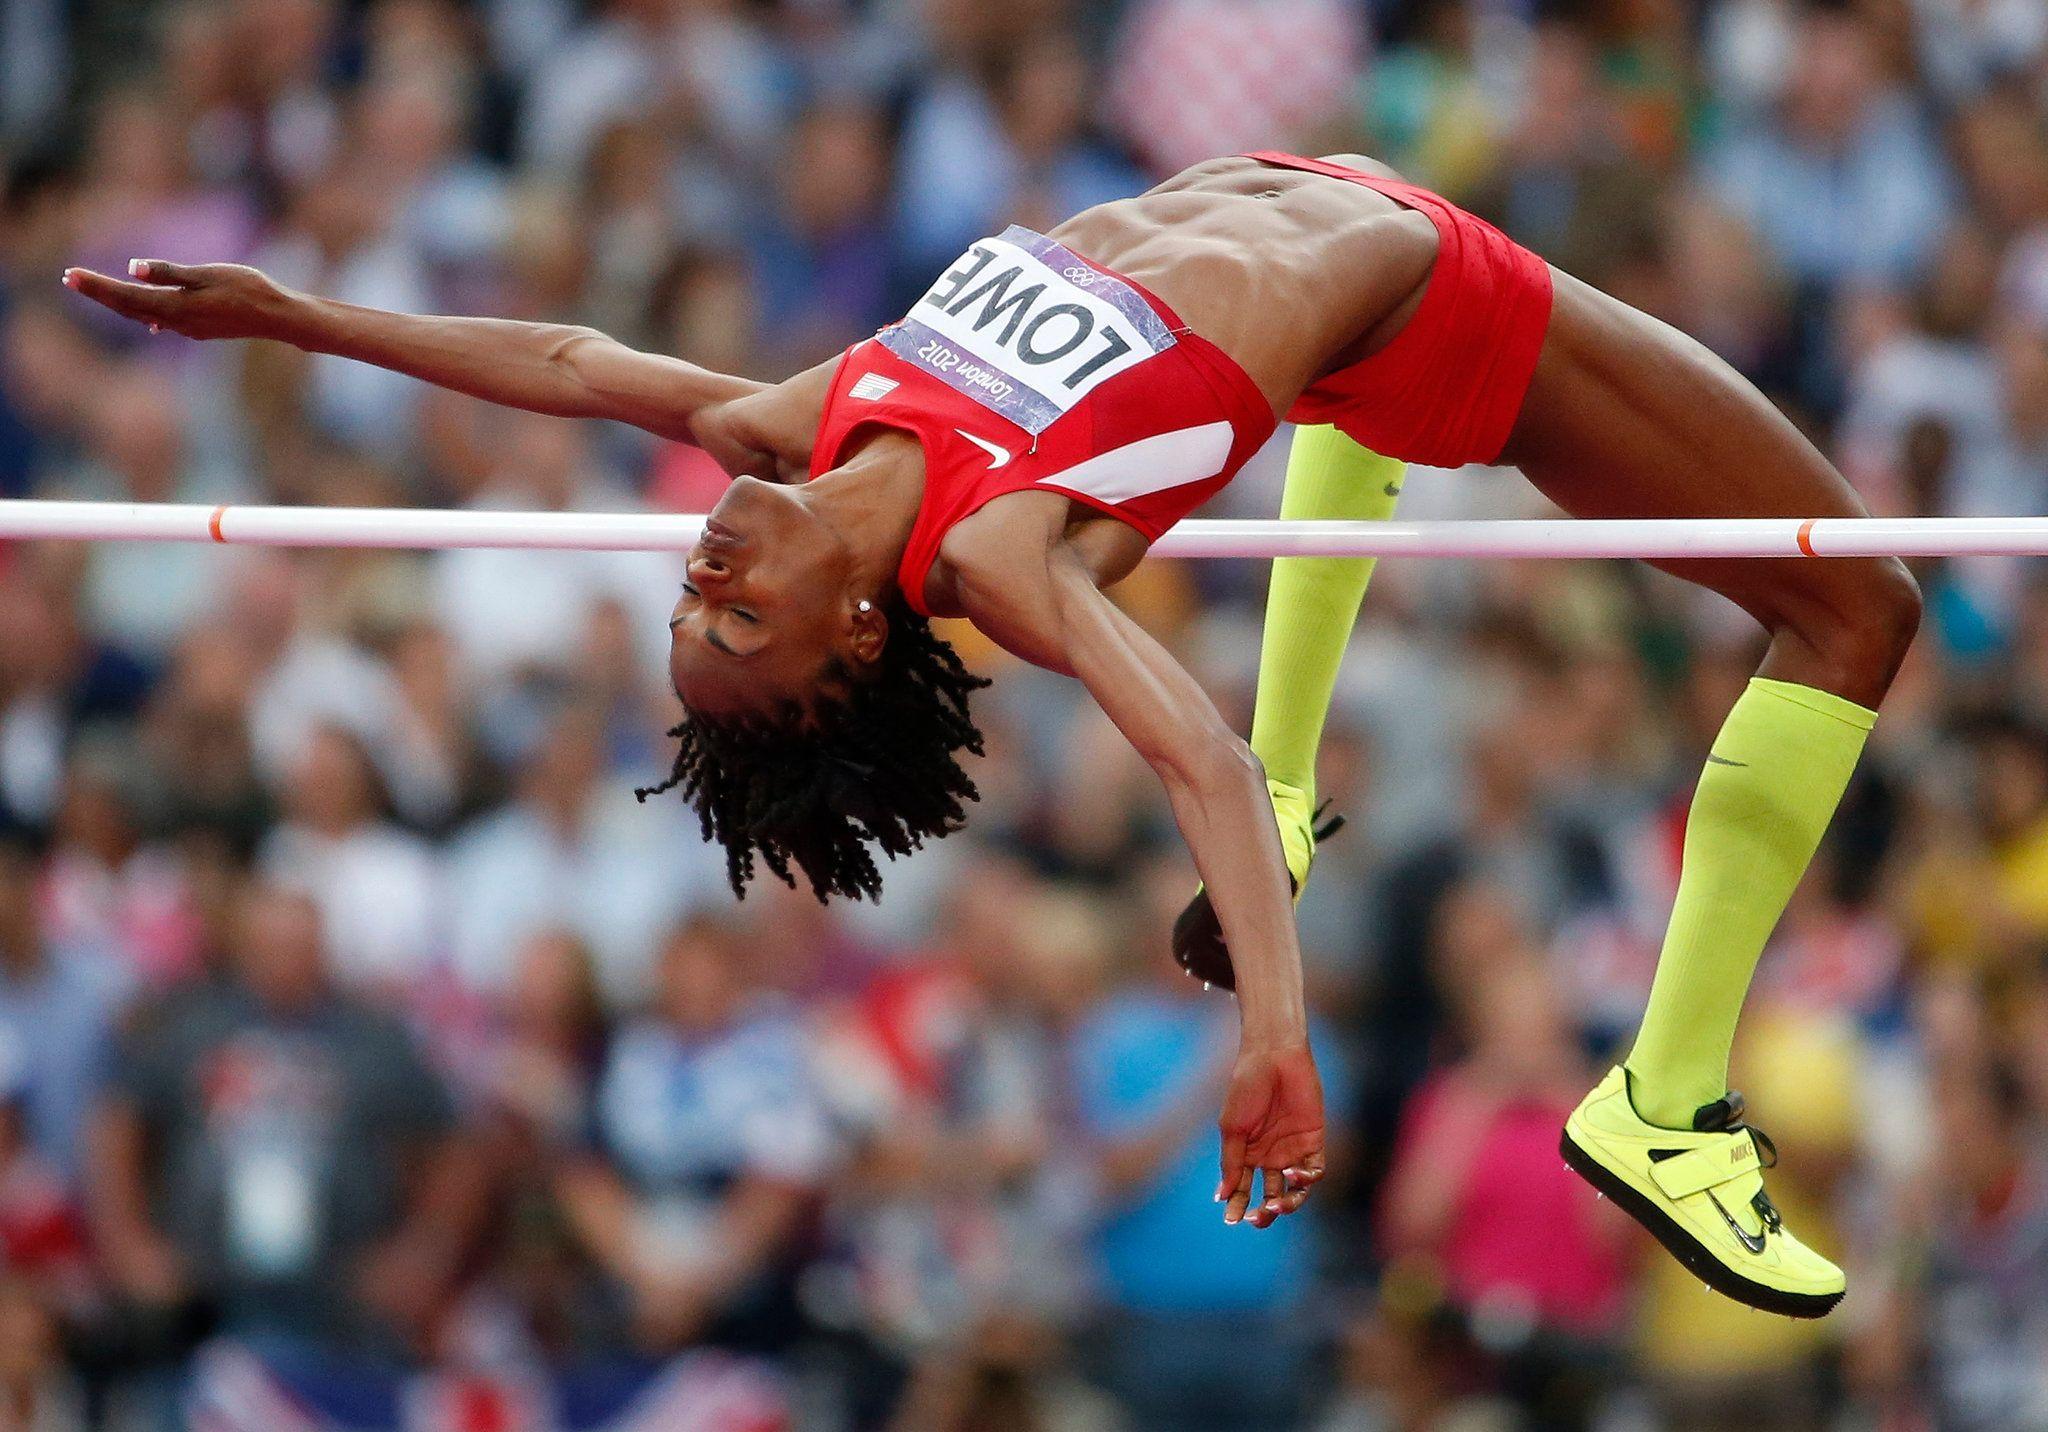 Olympic Medal Earned Glory Denied Future Uncertain The New York Times Olympic Medal Earned Glory Denied Future Uncertain The New Y 2020 Yuksek Atlama